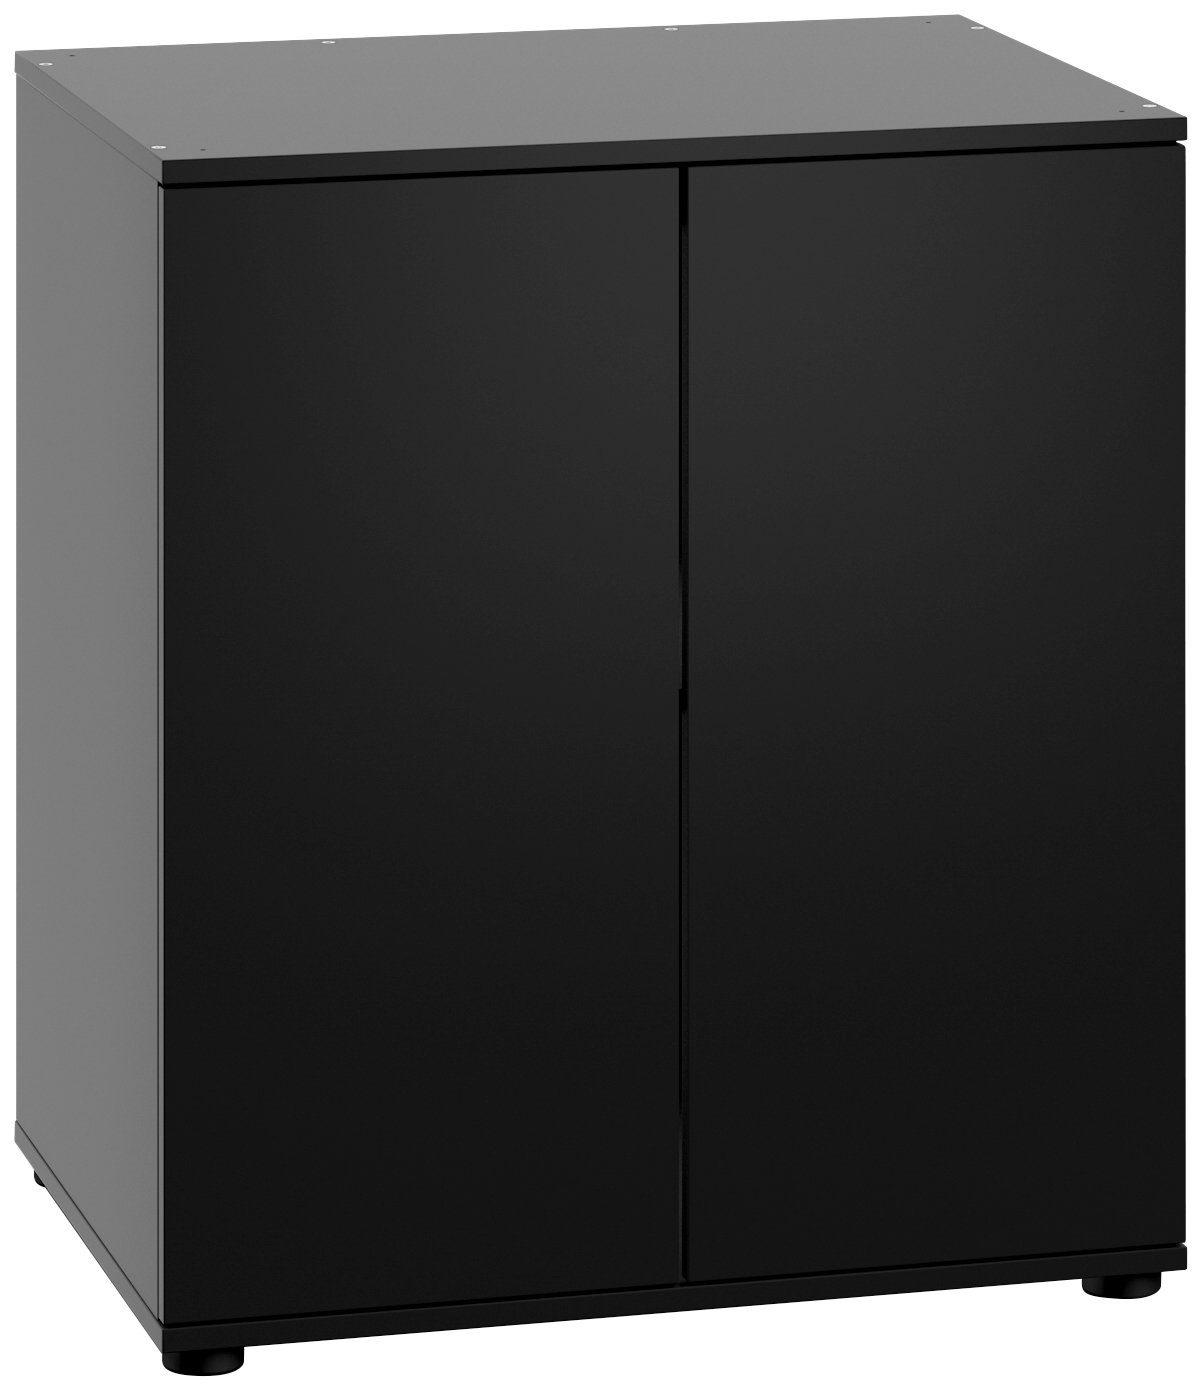 Aquarien-Unterschrank »SBX Lido 200«, BxTxH: 71x51x80 cm, schwarz